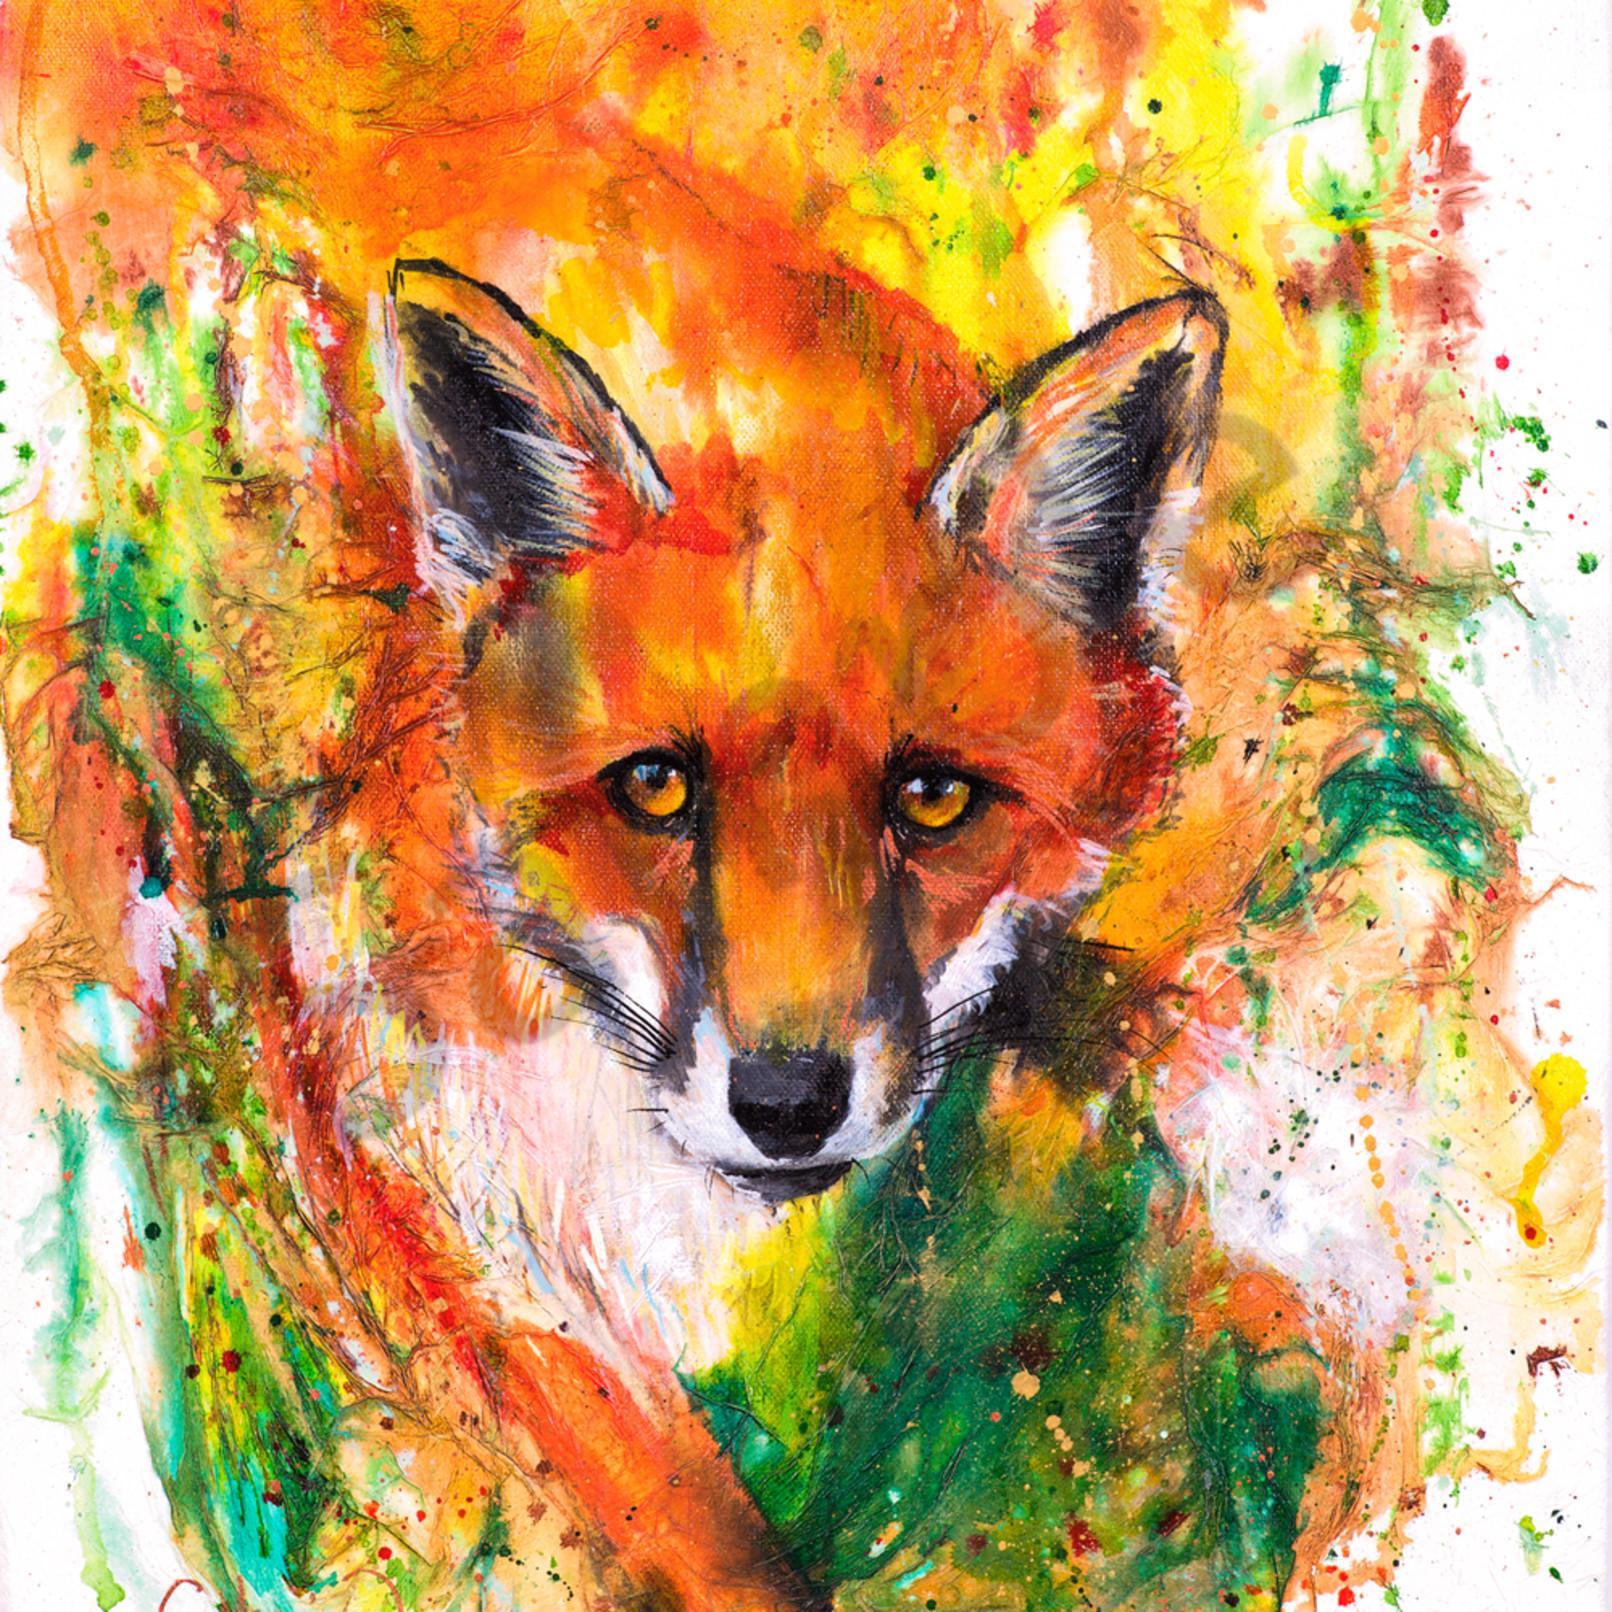 C clark dowden 002 fox fqlpr7